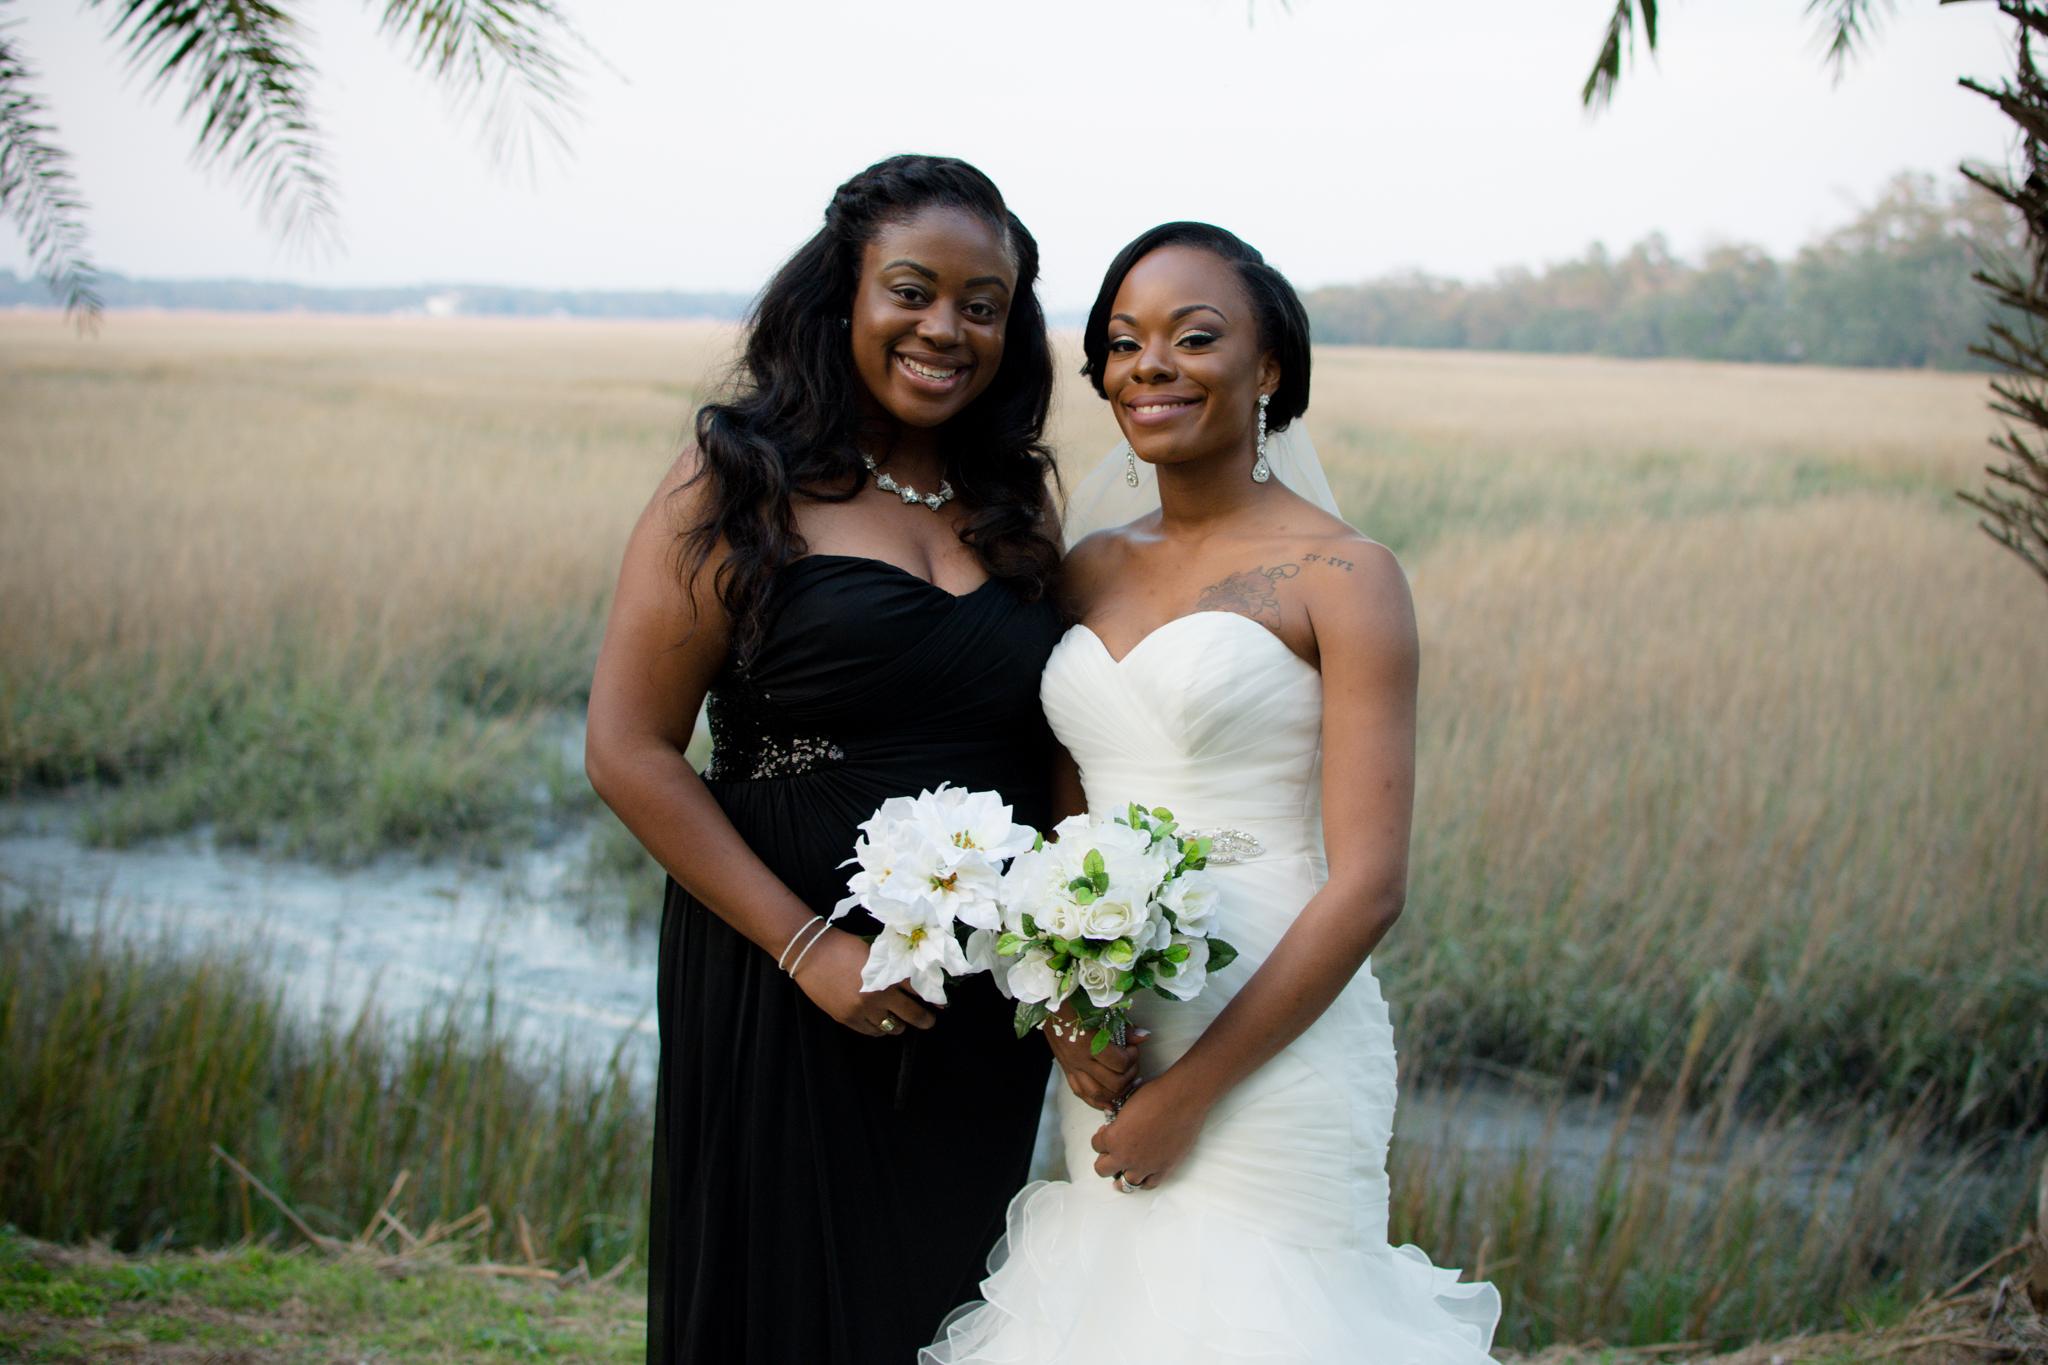 chaplin wedding (94 of 181).JPG